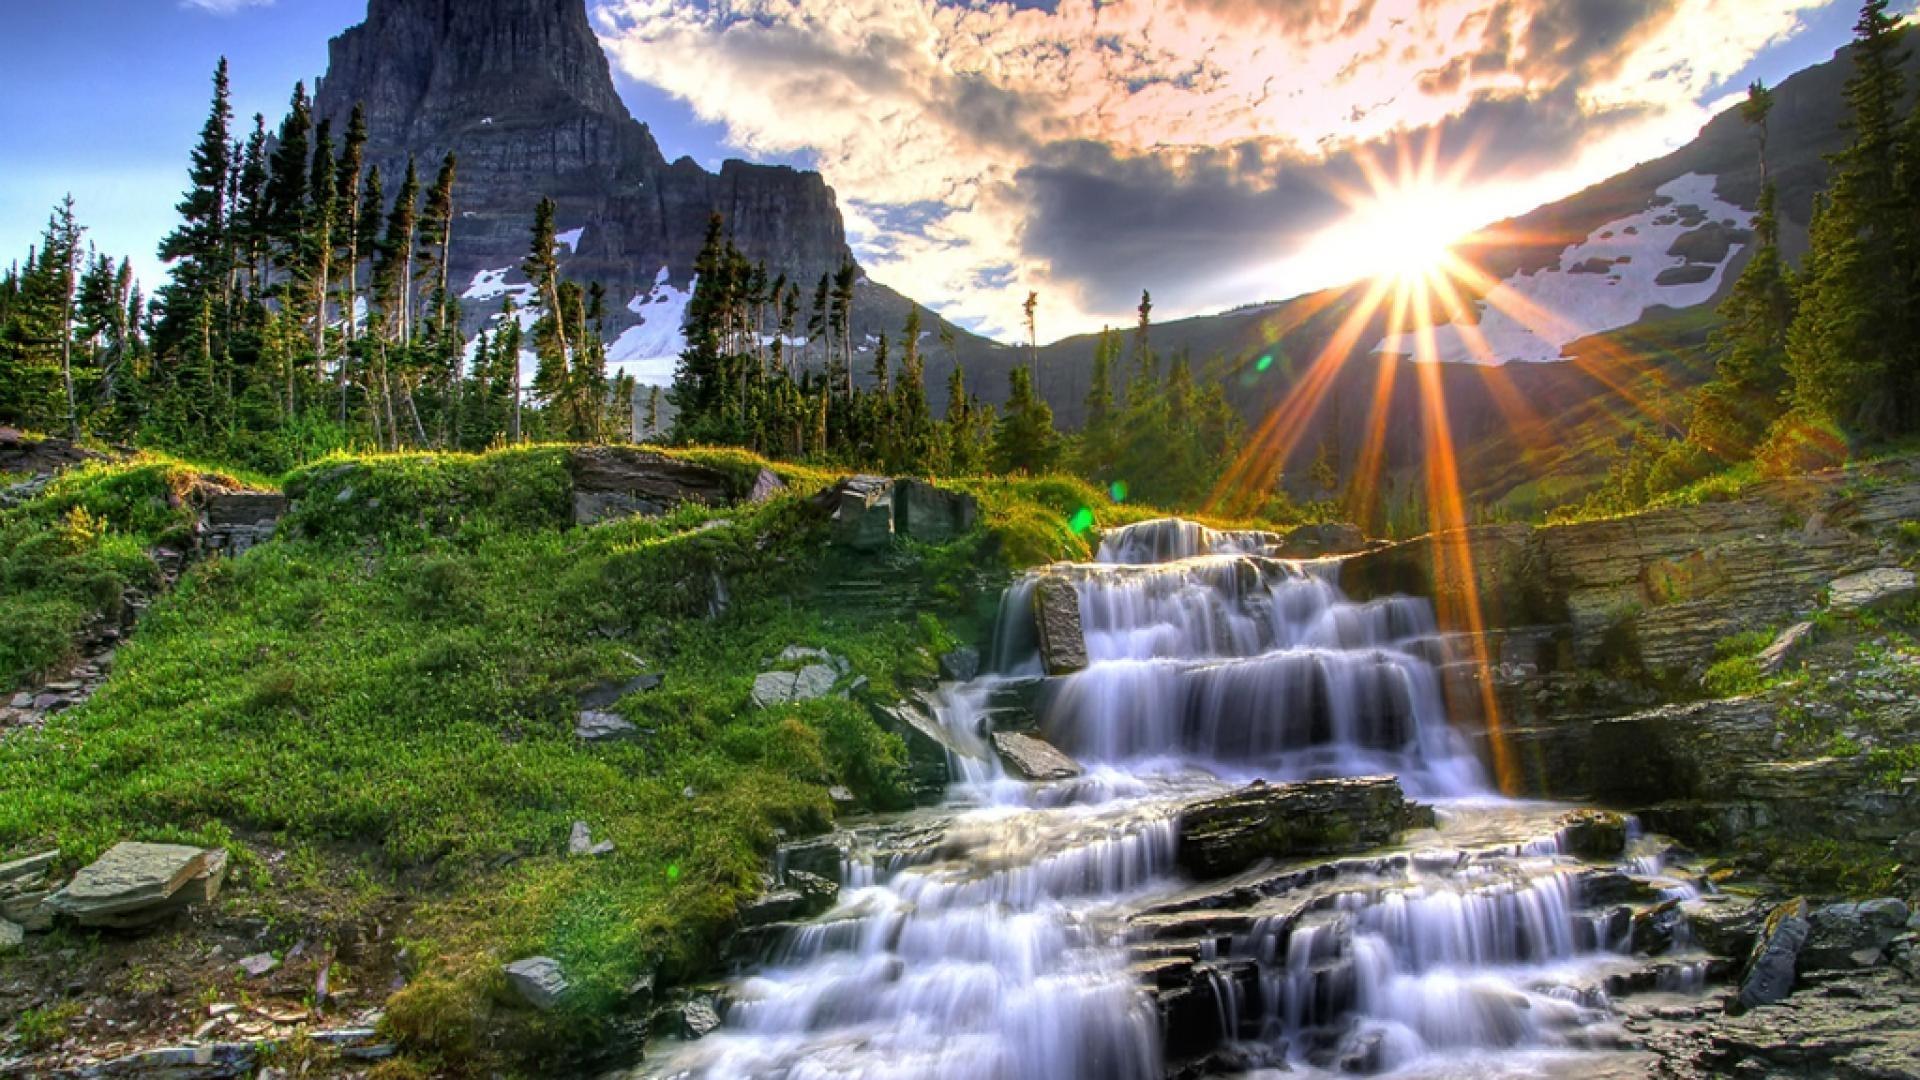 waterfalls-nature-hd-wallpaper - wallpaper.wiki